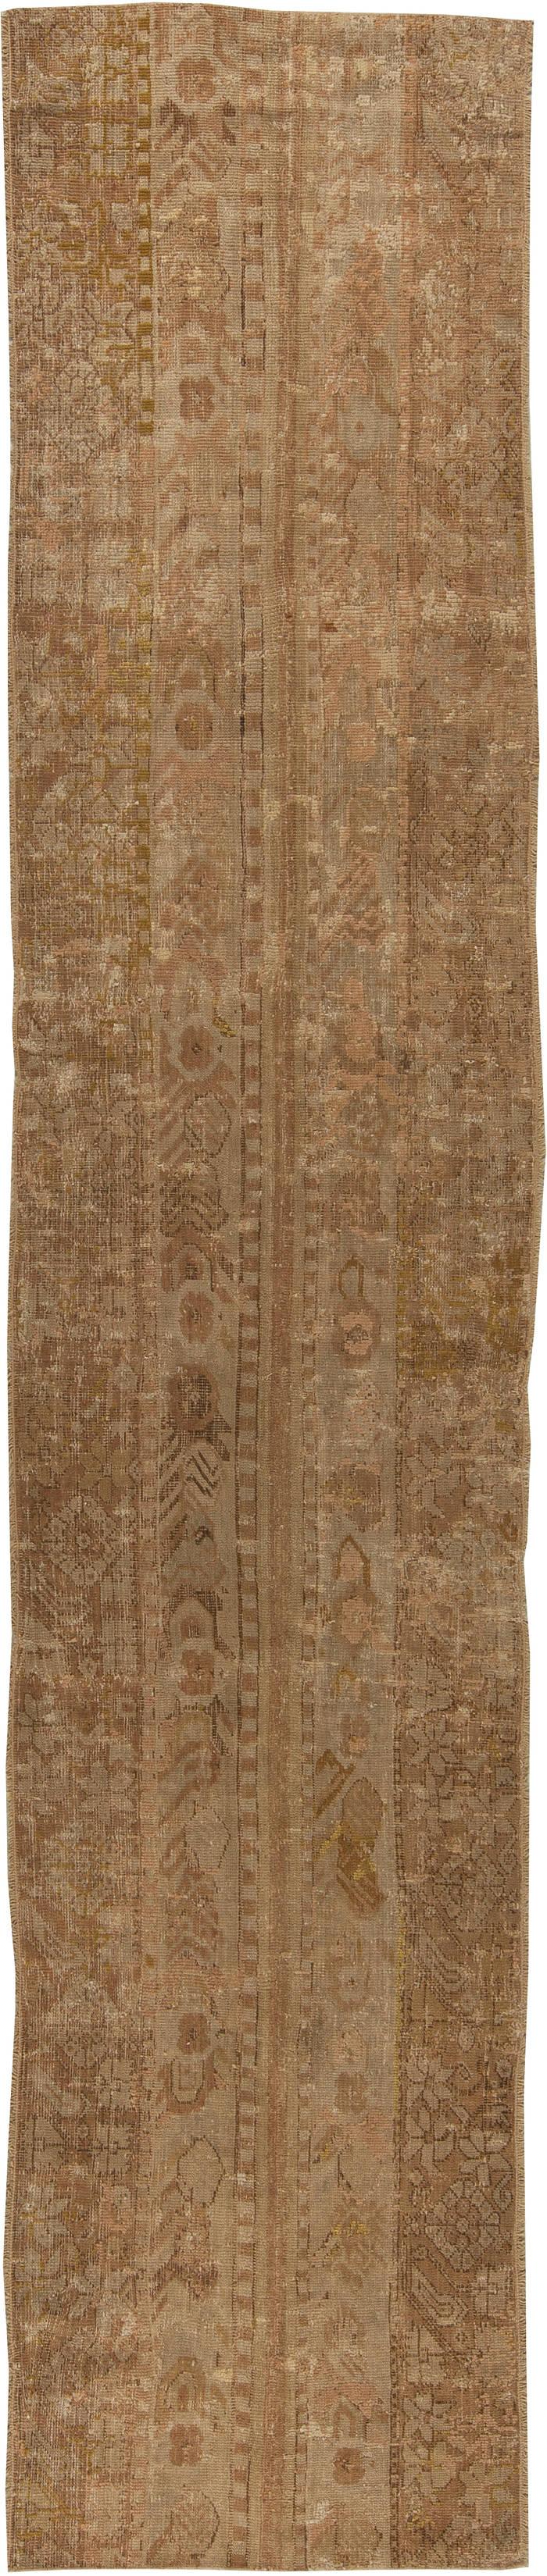 Antique Turkish Ghiordes Runner (size adjusted) BB5450